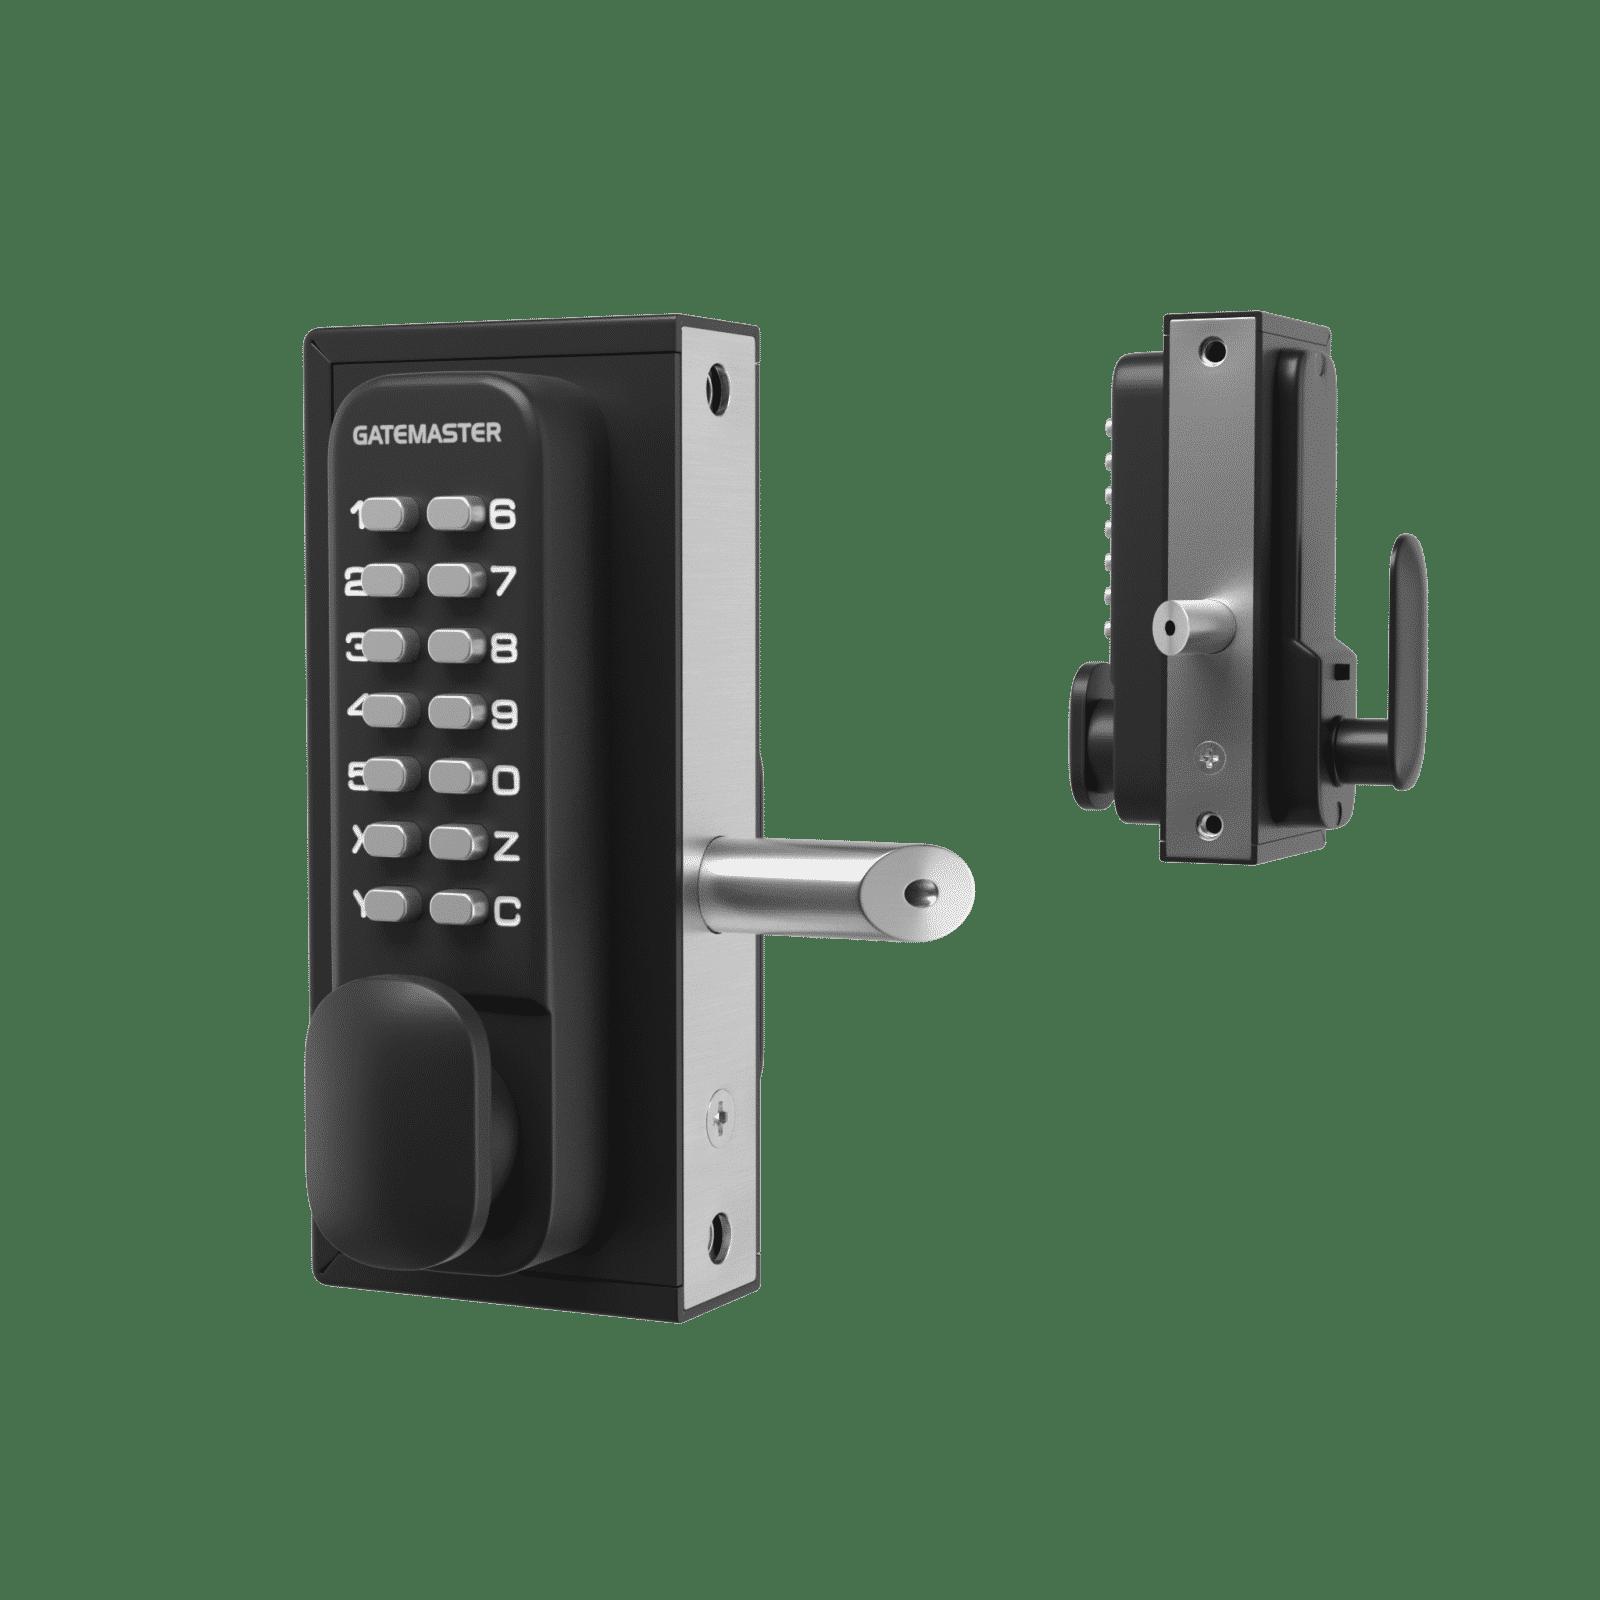 Bdgs Gatemaster Digital Superlock Gate Lock Single Sided